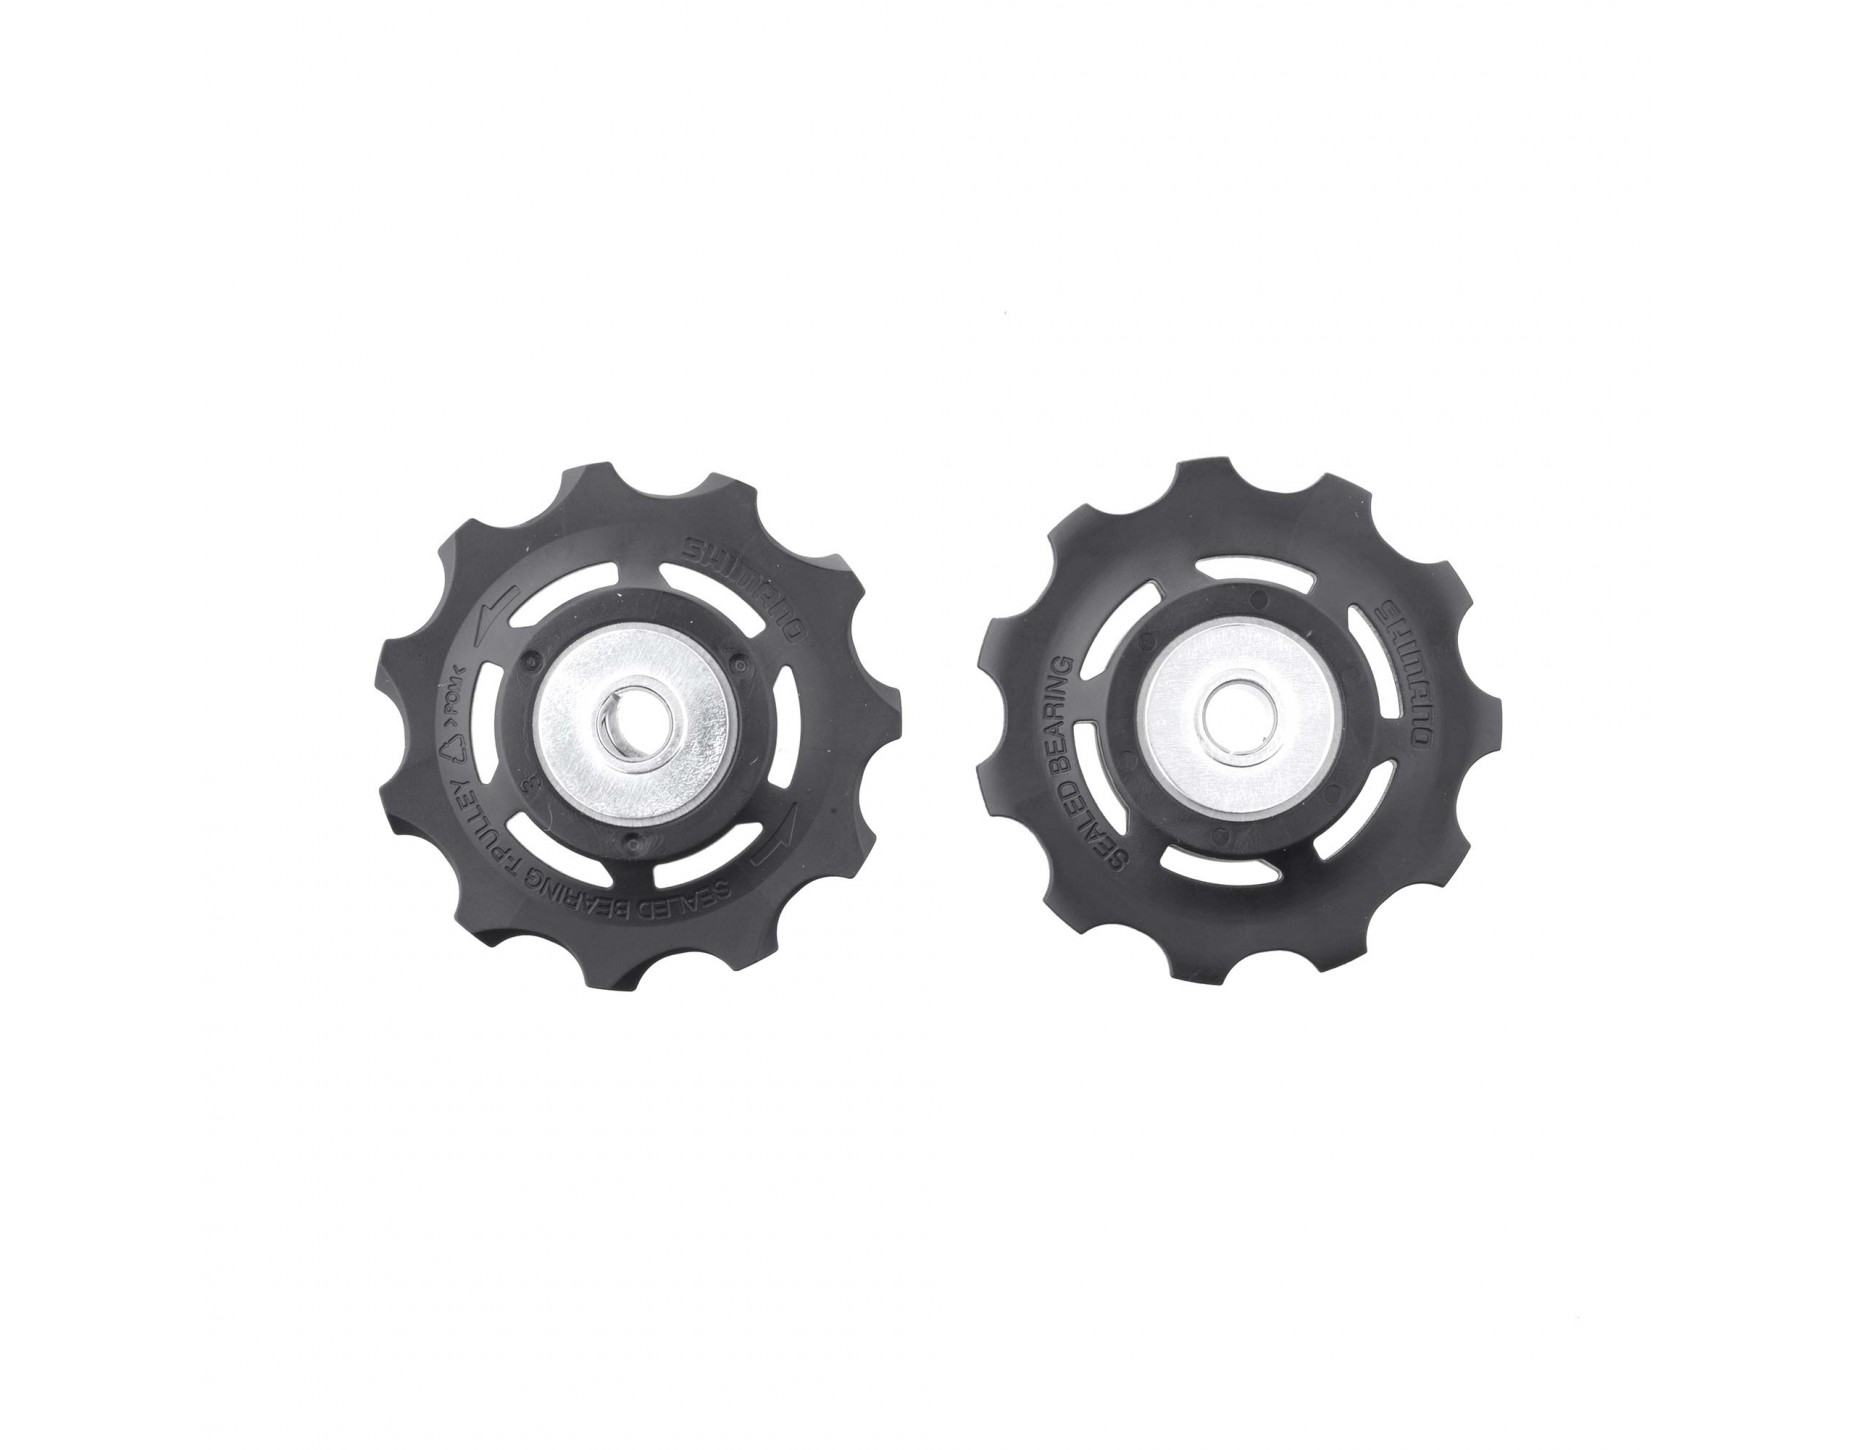 Shimano 11 tooth Jockey Wheels / Gear Pulleys Ultegra 6800 6870 11 speed